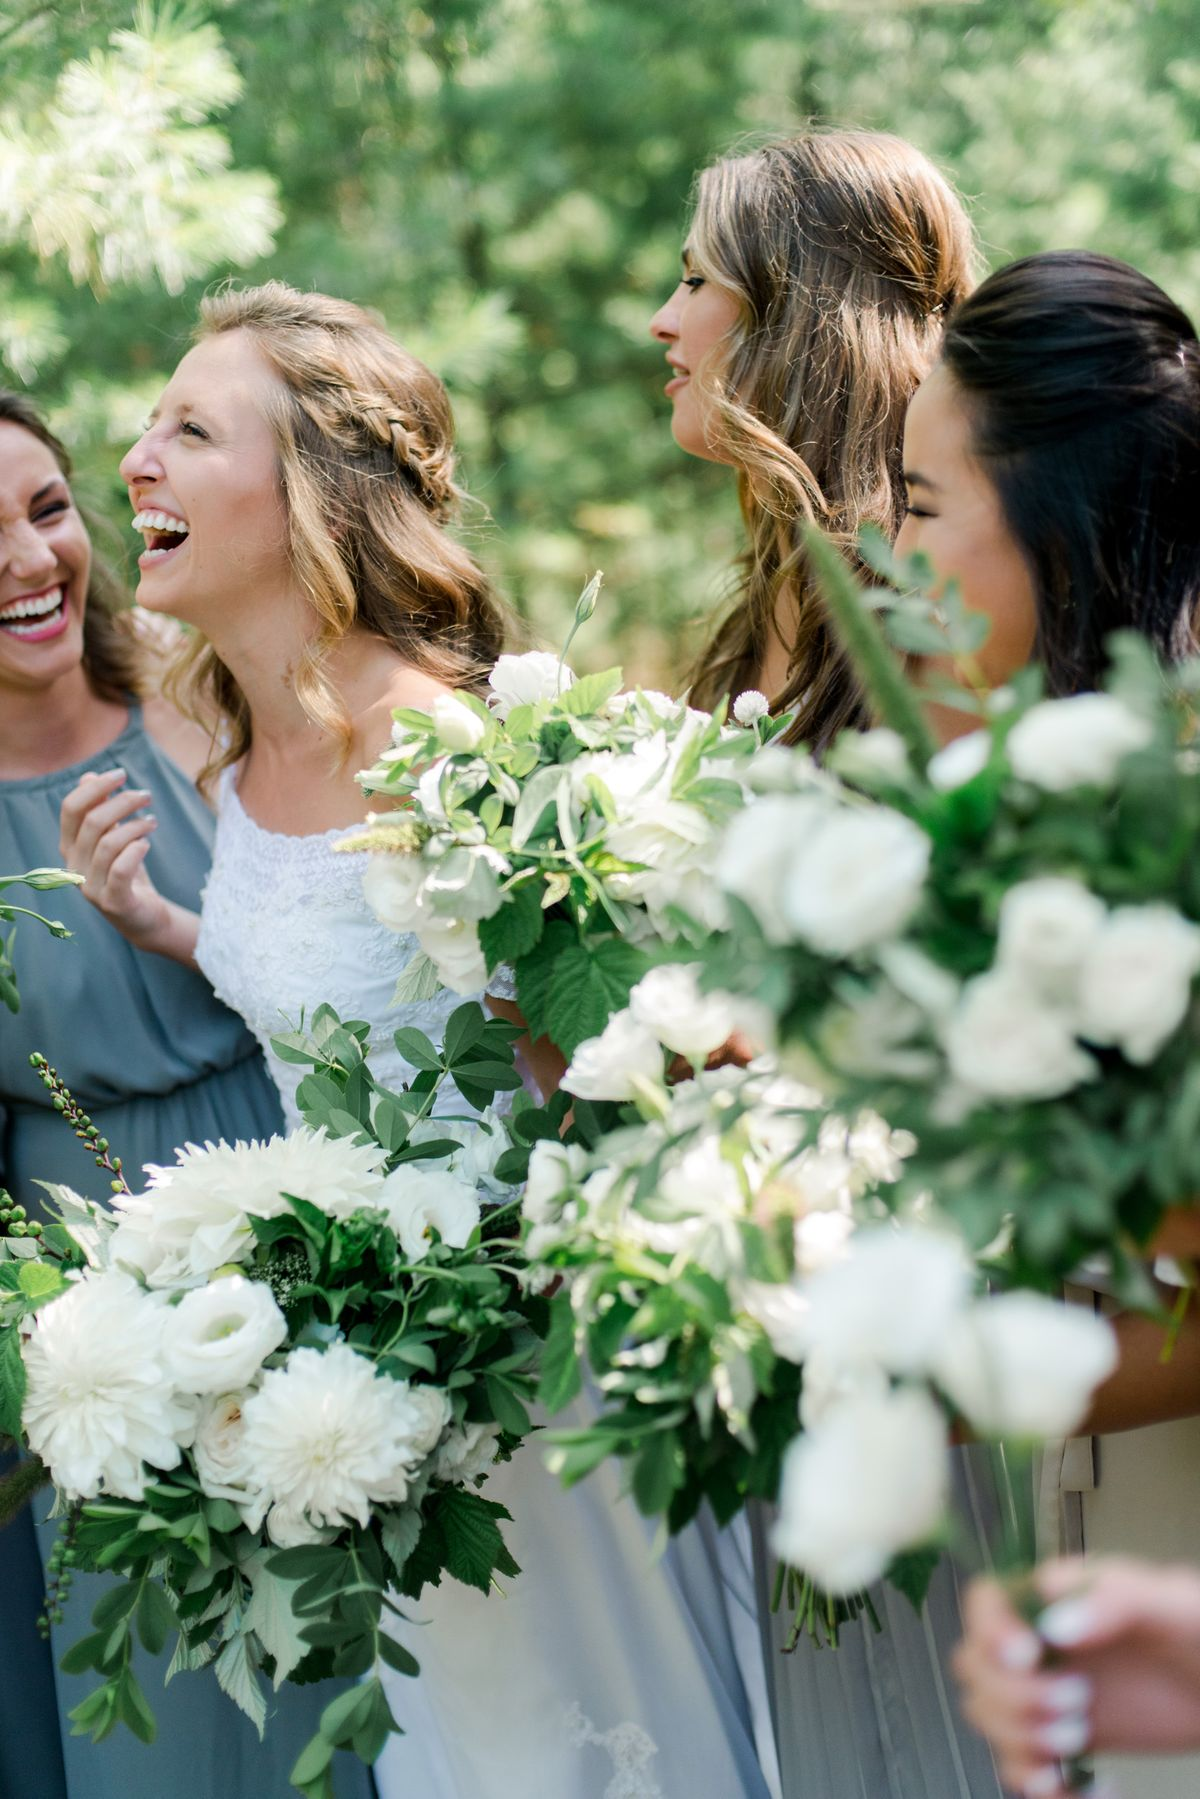 Bride Laughing Outside - CampBride